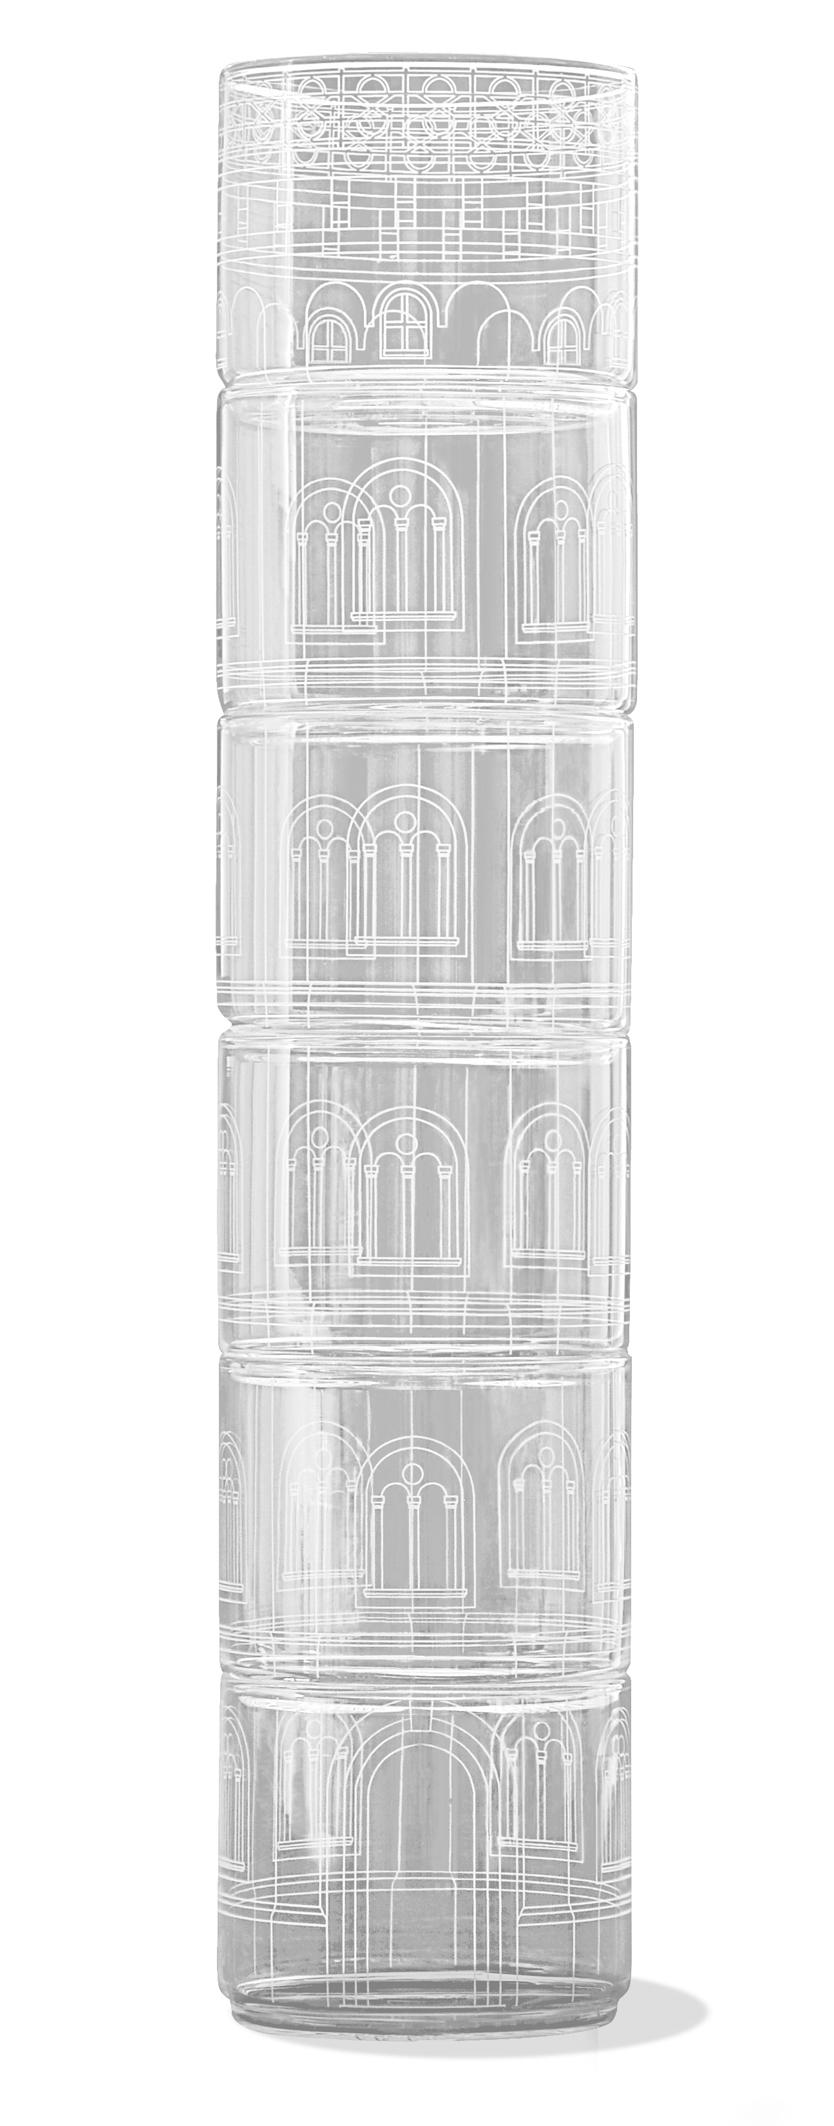 TORRE CHIARA DRINKING GLASSES